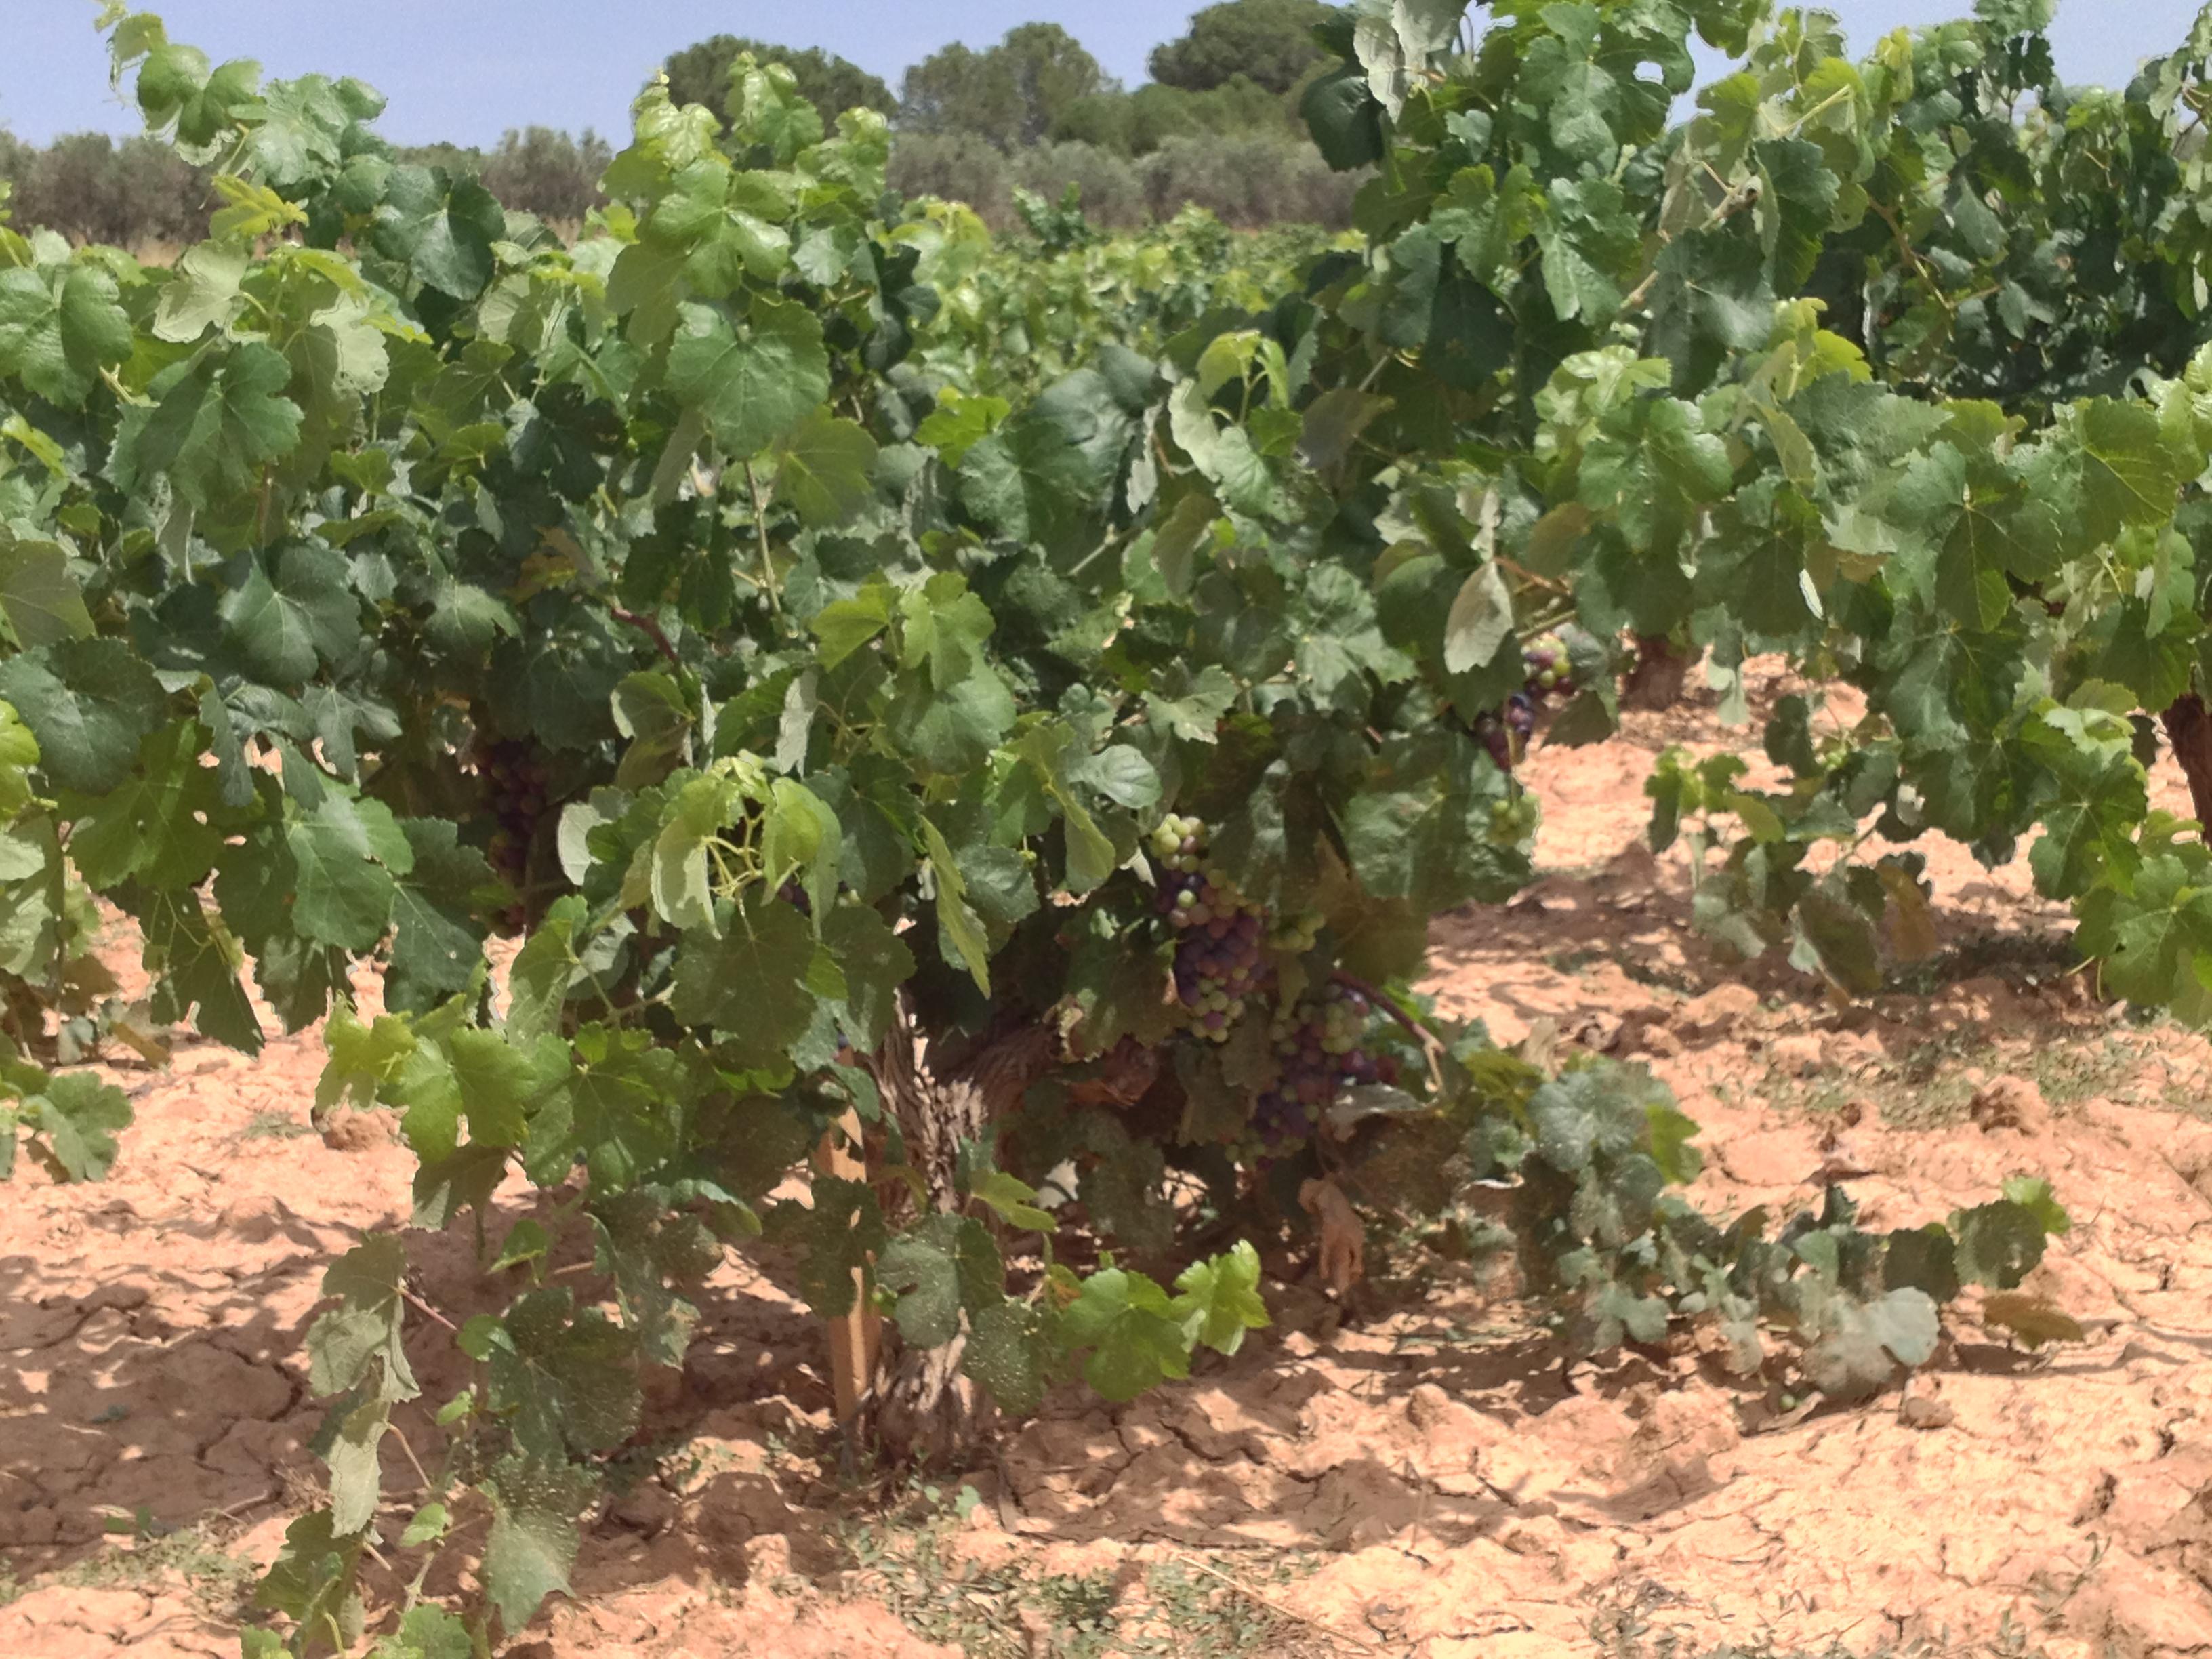 Old Vine Bobal in Utiel-Requena